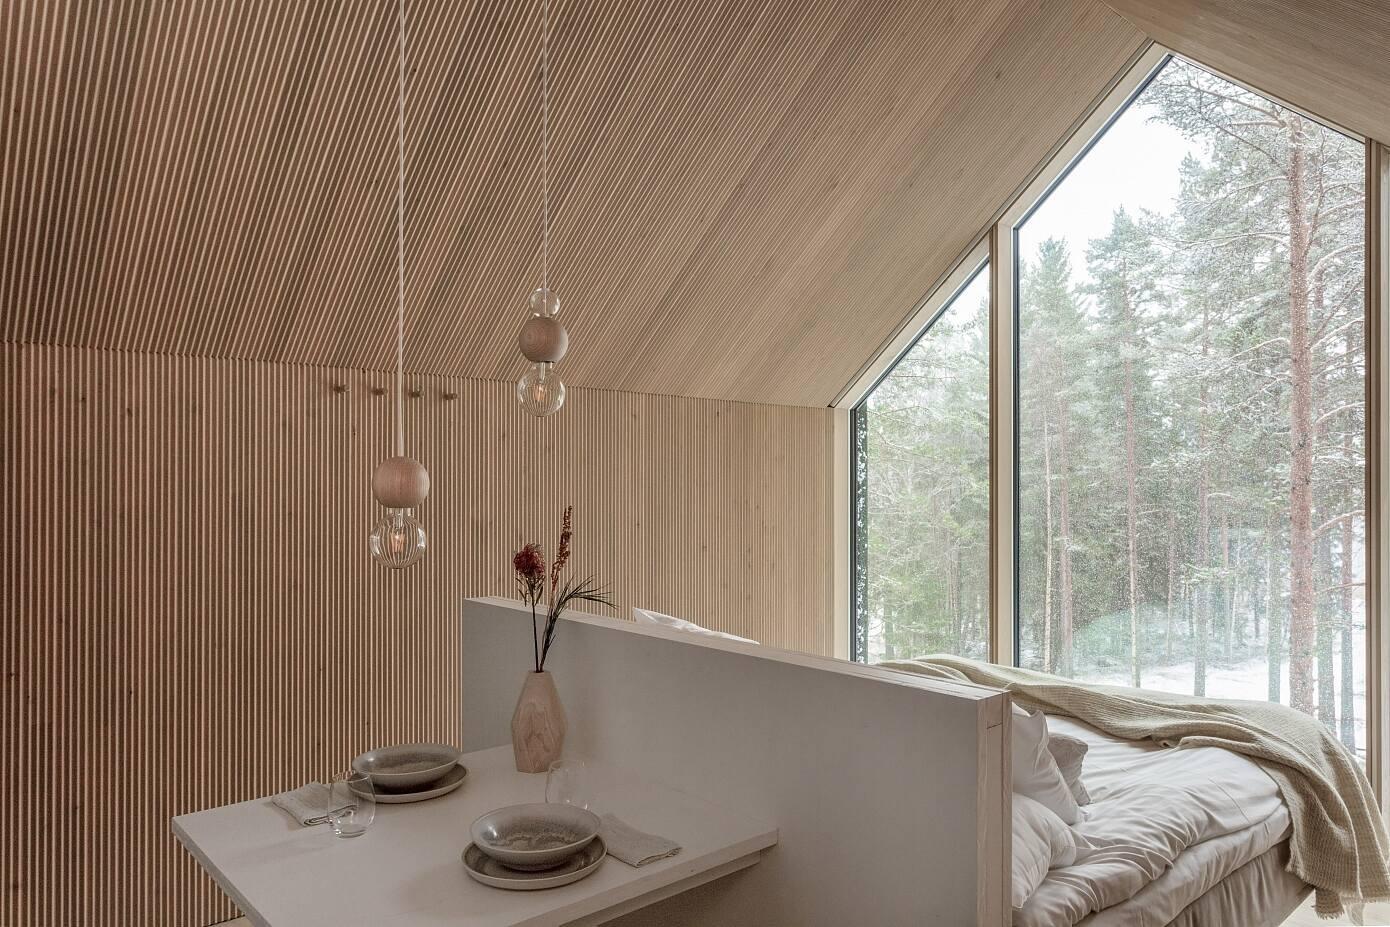 Niliaitta Prototype by Studio Puisto Architects